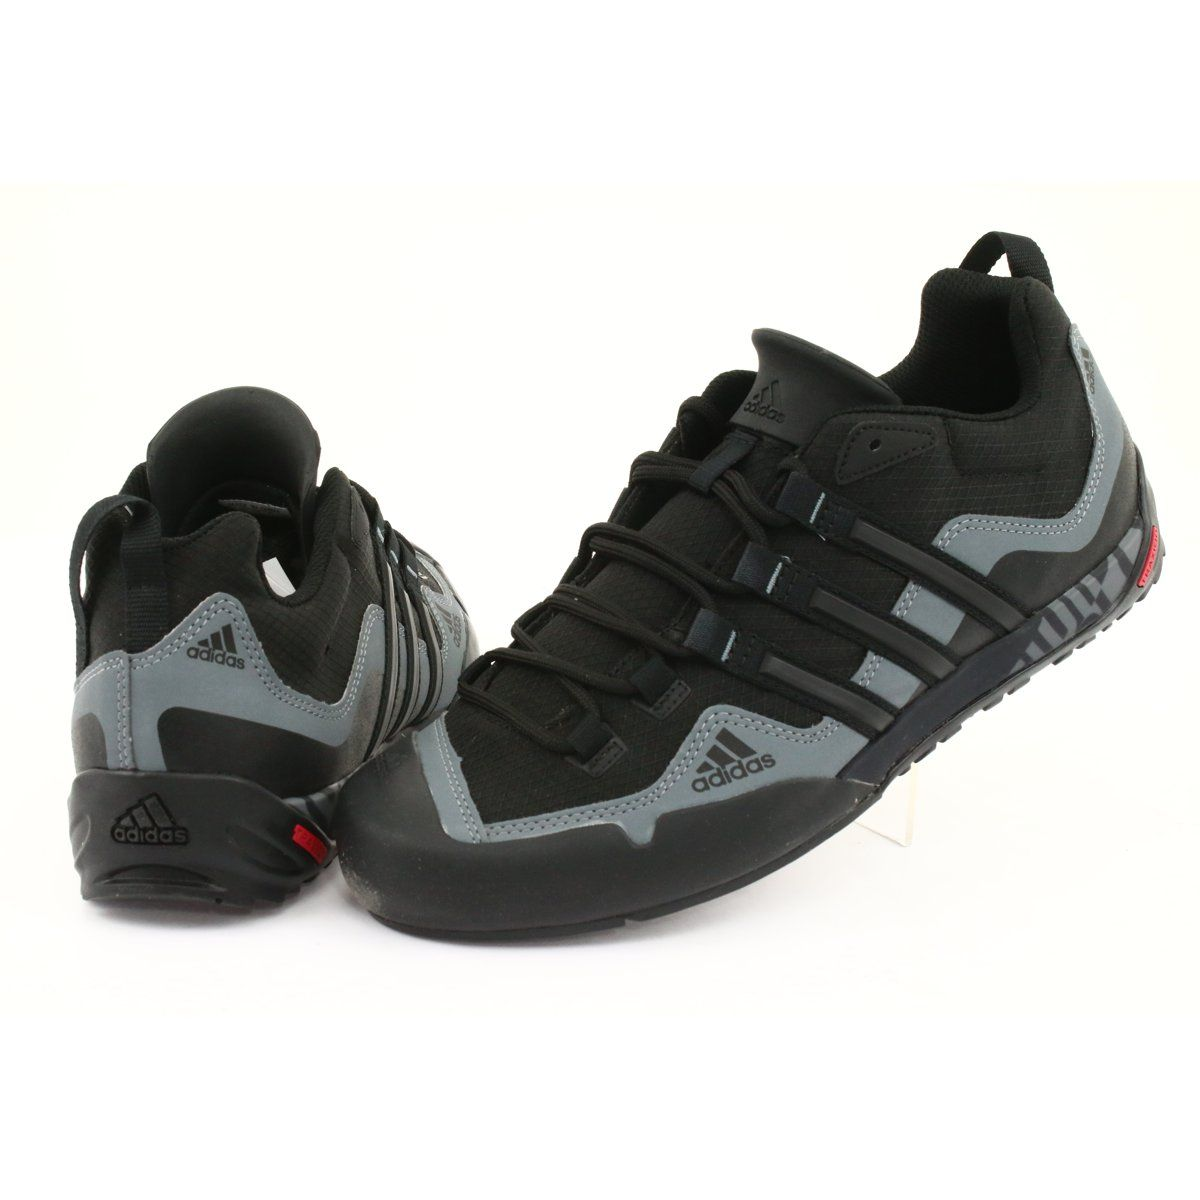 Buty Adidas Terrex Swift Solo M D67031 Czarne Szare Sports Shoes Adidas Adidas Black Shoes